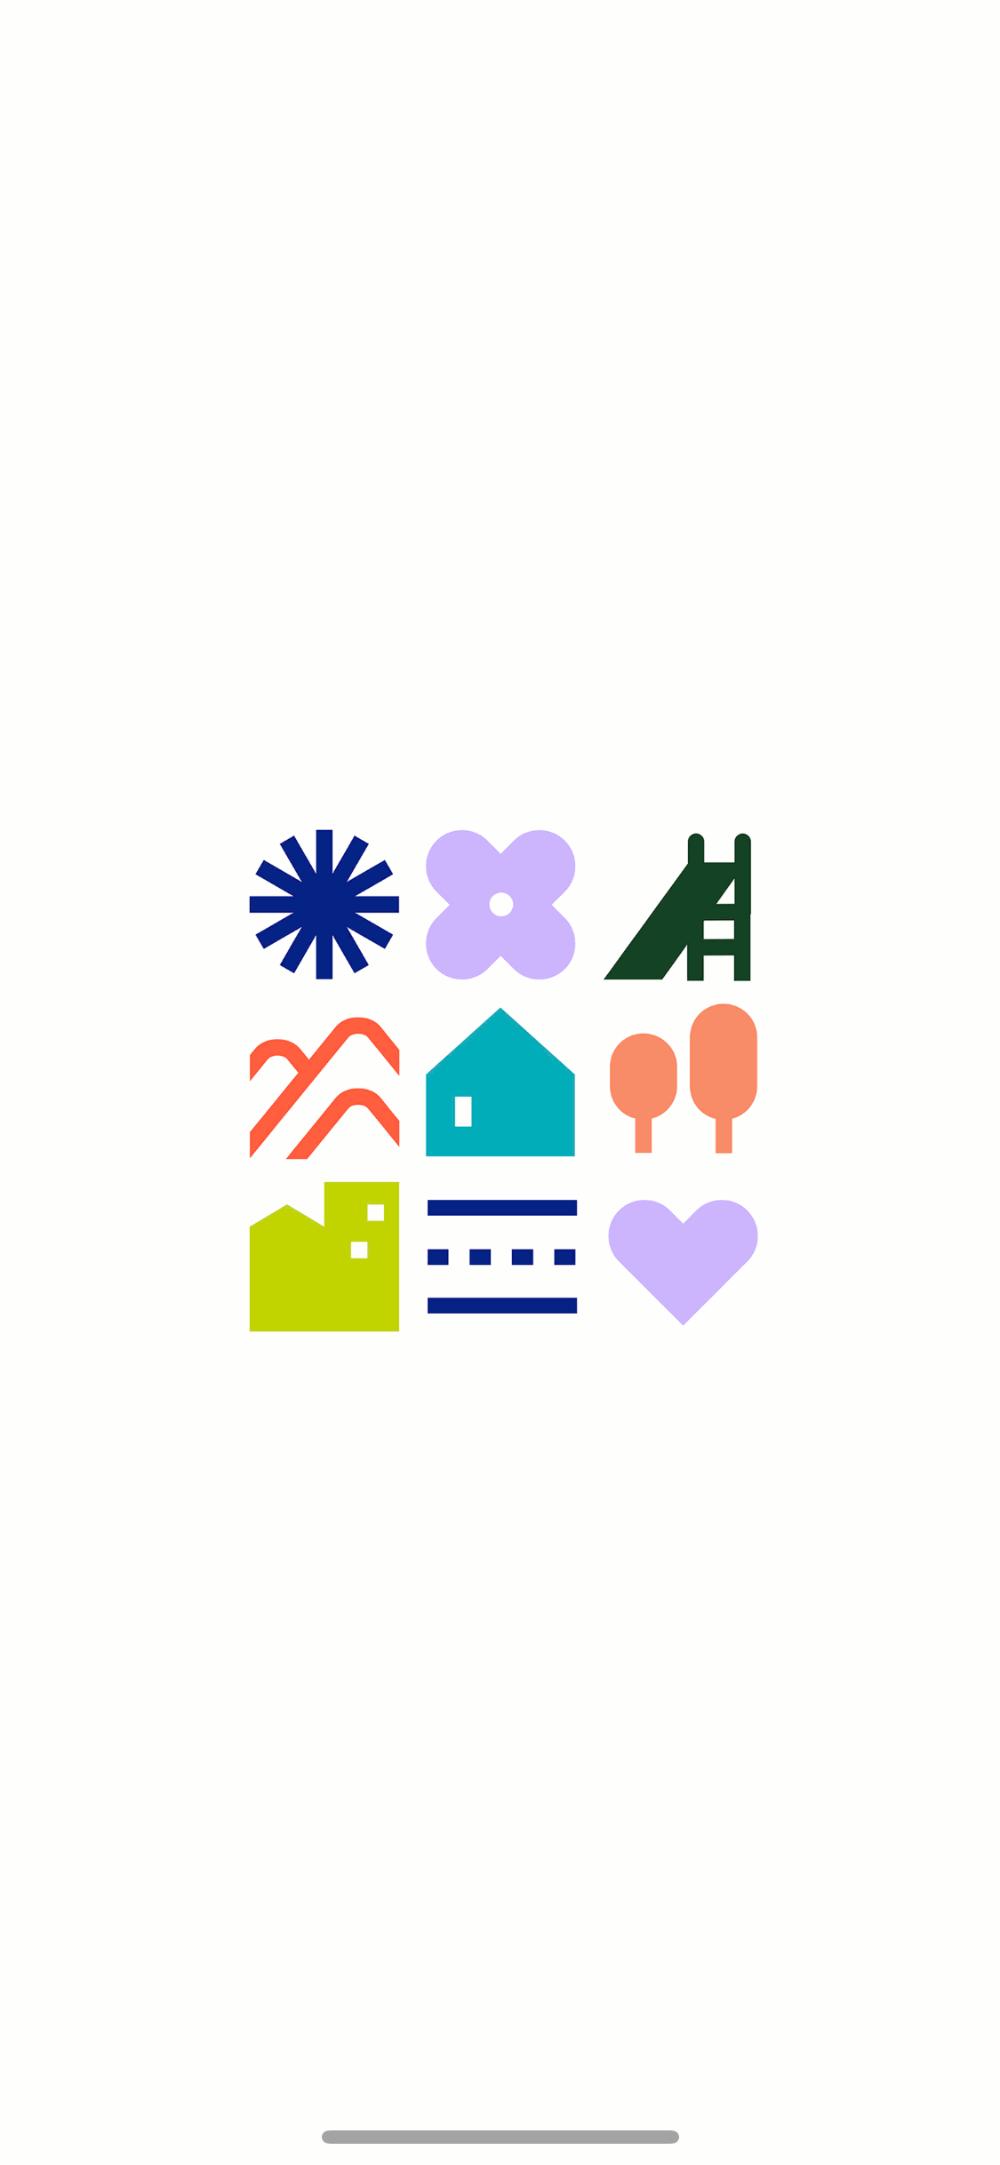 Trulia Ios Design Patterns Mobbin Mobile Design Patterns Identity Design Logo Ios Design